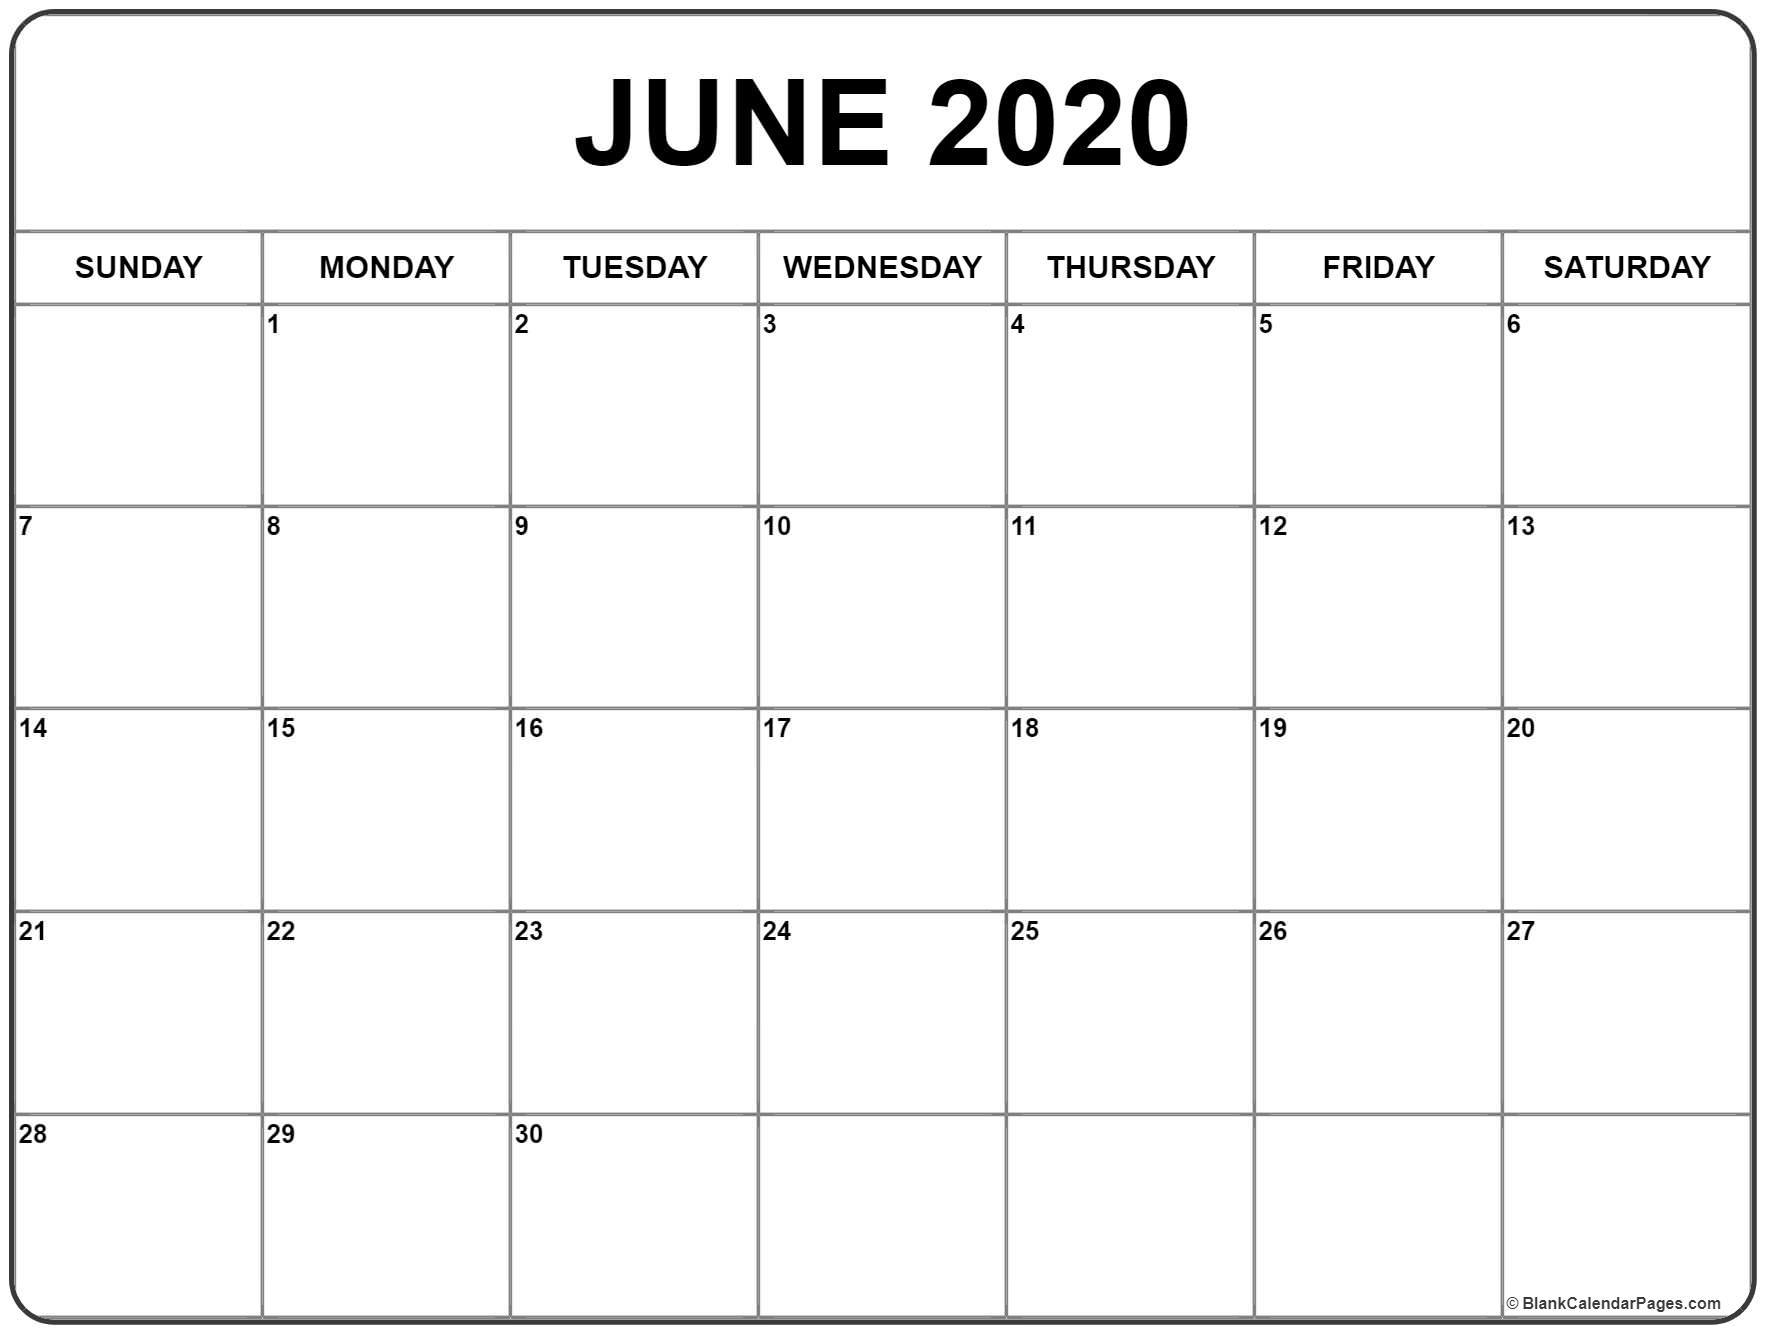 June 2020 Calendar | Free Printable Monthly Calendars in Free Printable Fill In Calendars 2020